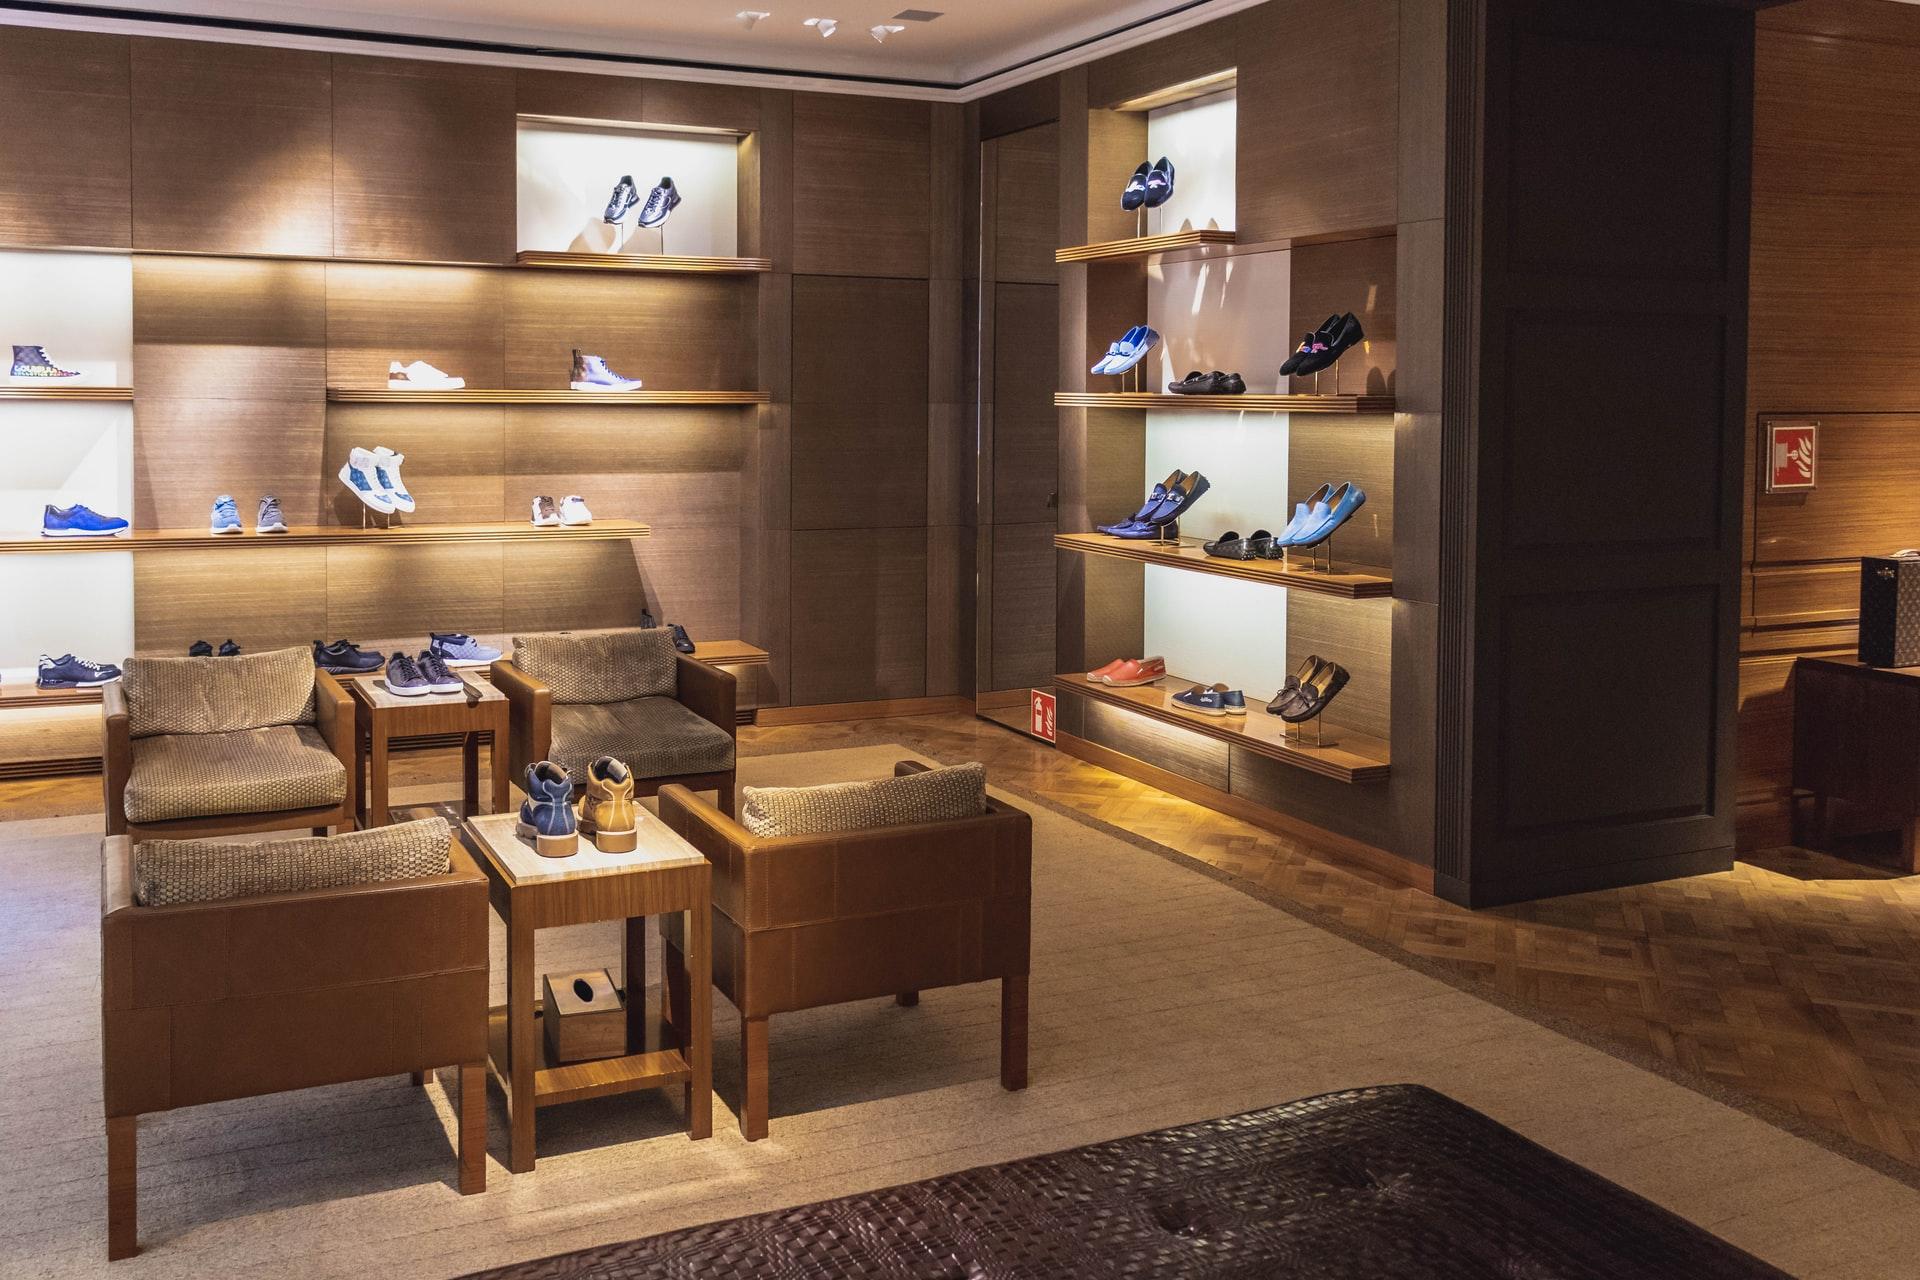 Koopr-magasin-chaussures-ChristianWiediger-Unsplash